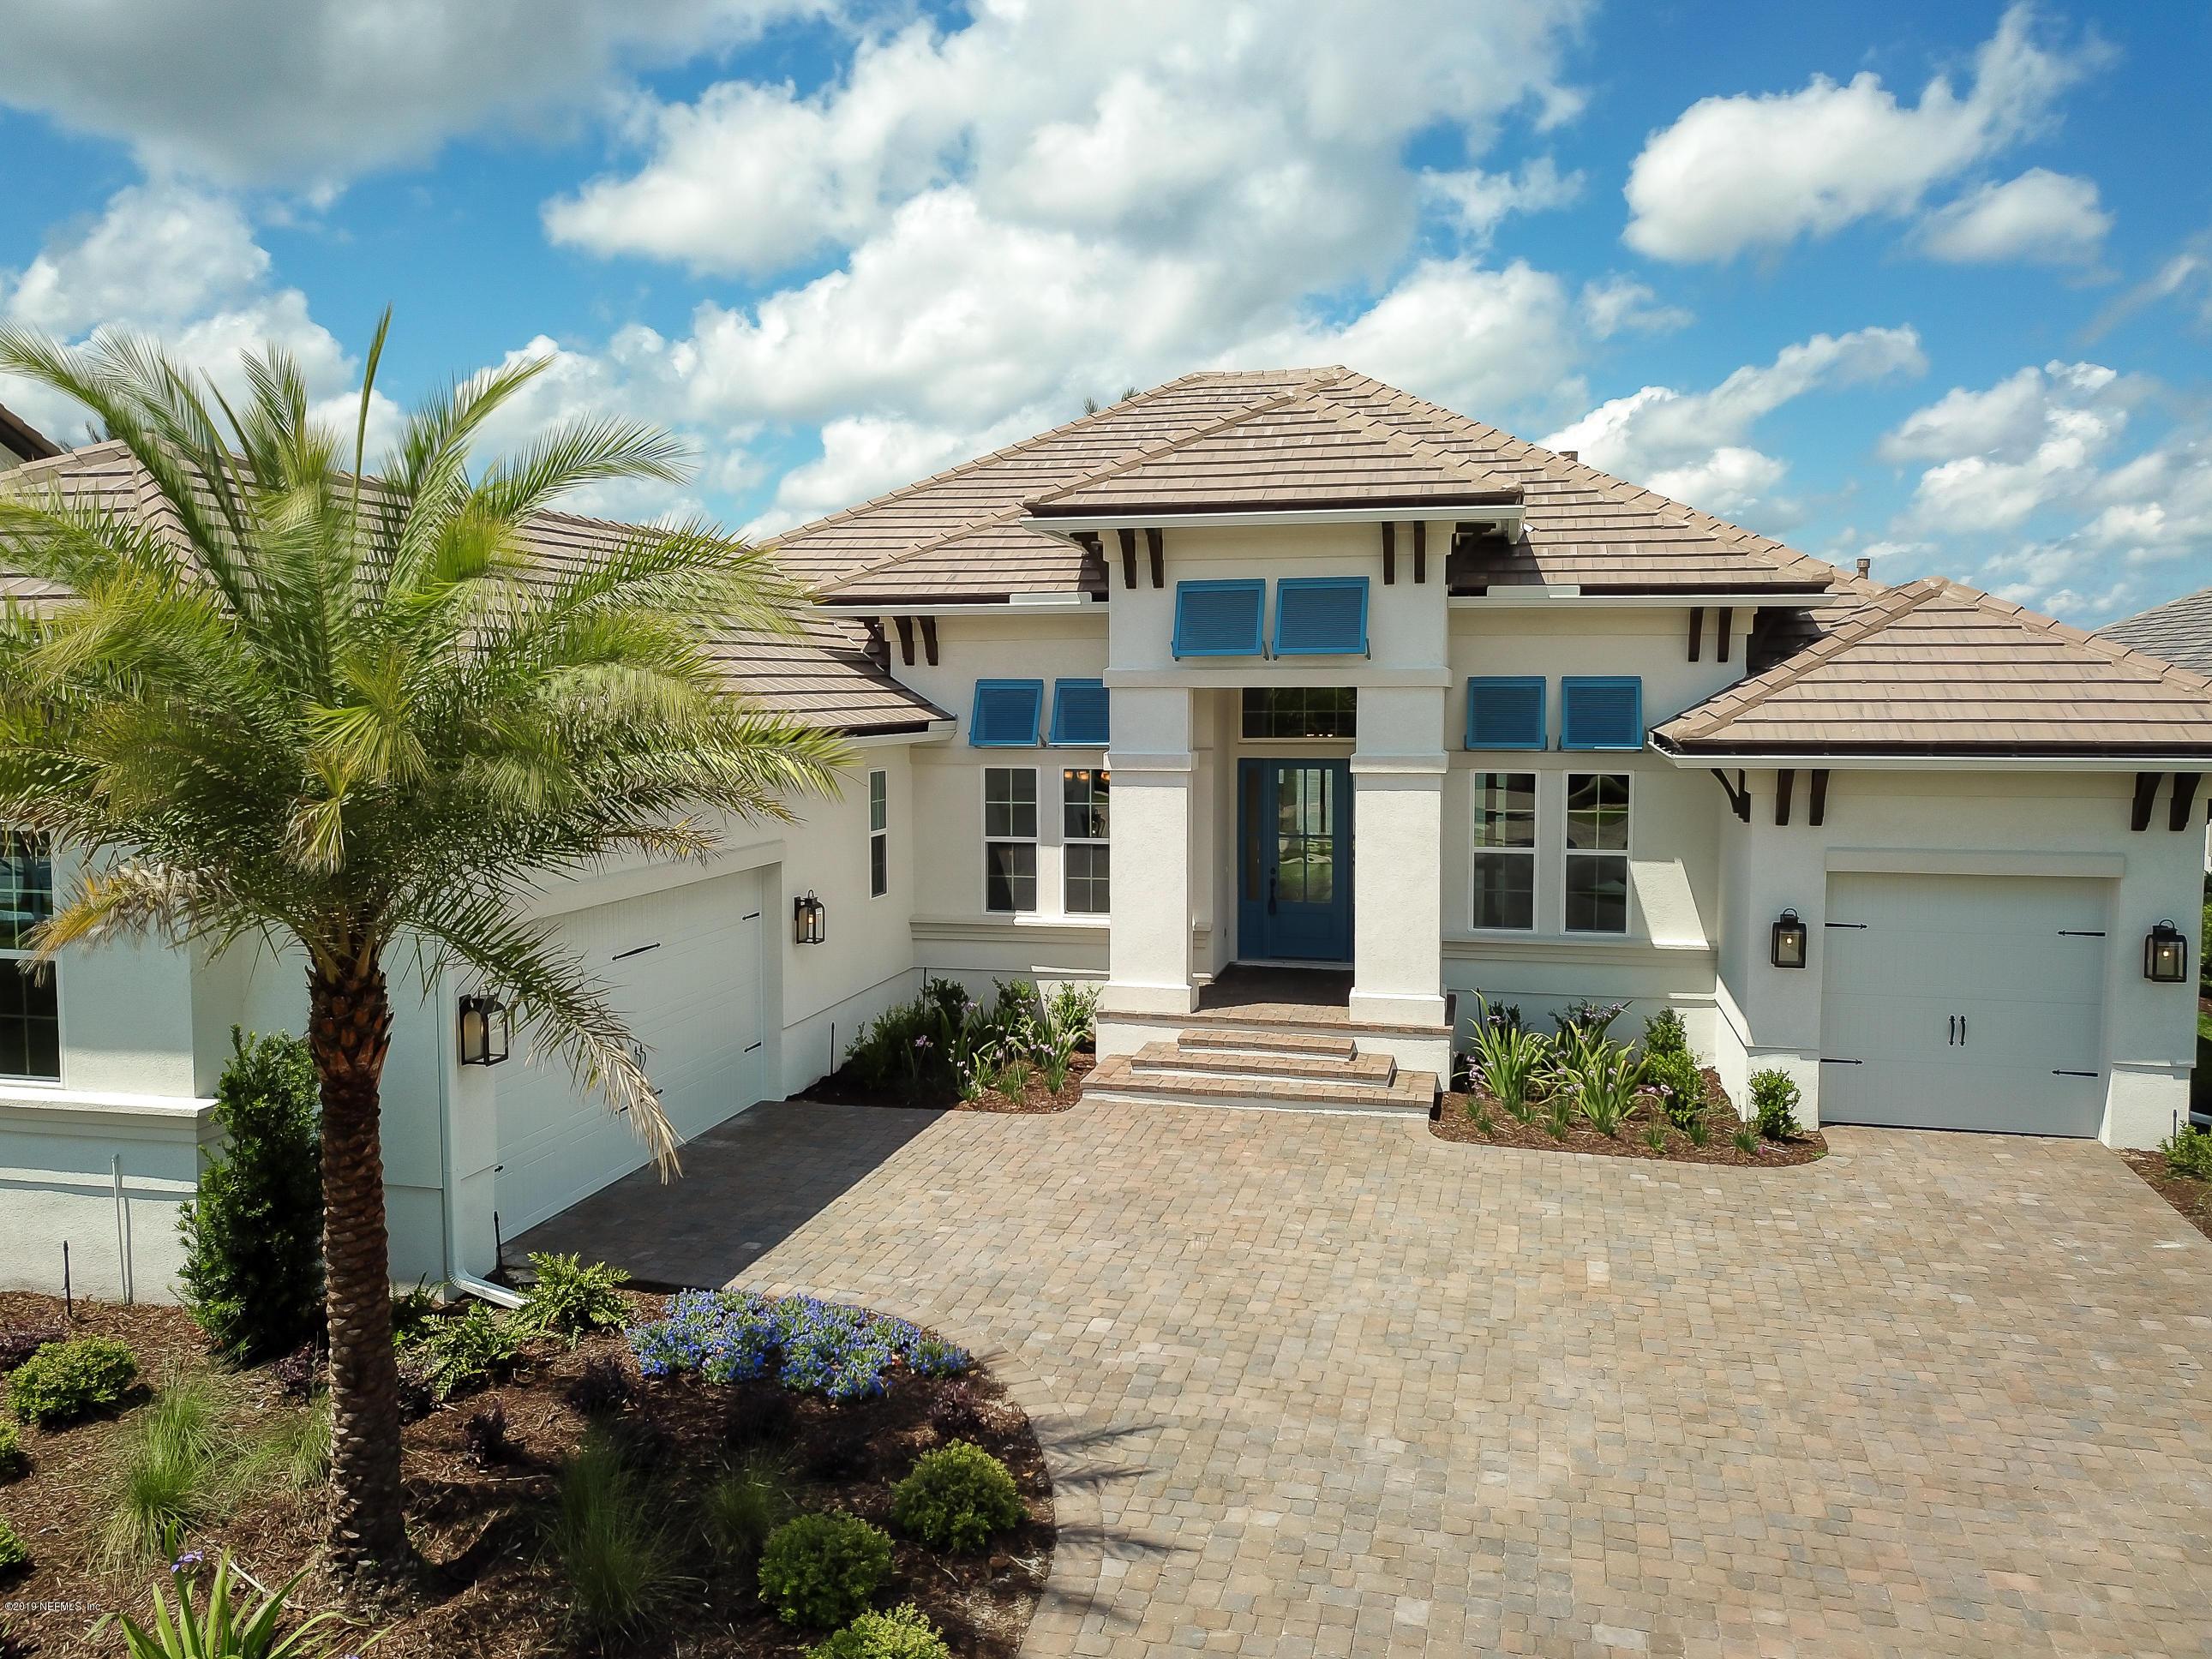 723 PROMENADE POINTE, ST AUGUSTINE, FLORIDA 32095, 4 Bedrooms Bedrooms, ,3 BathroomsBathrooms,Residential - single family,For sale,PROMENADE POINTE,960355